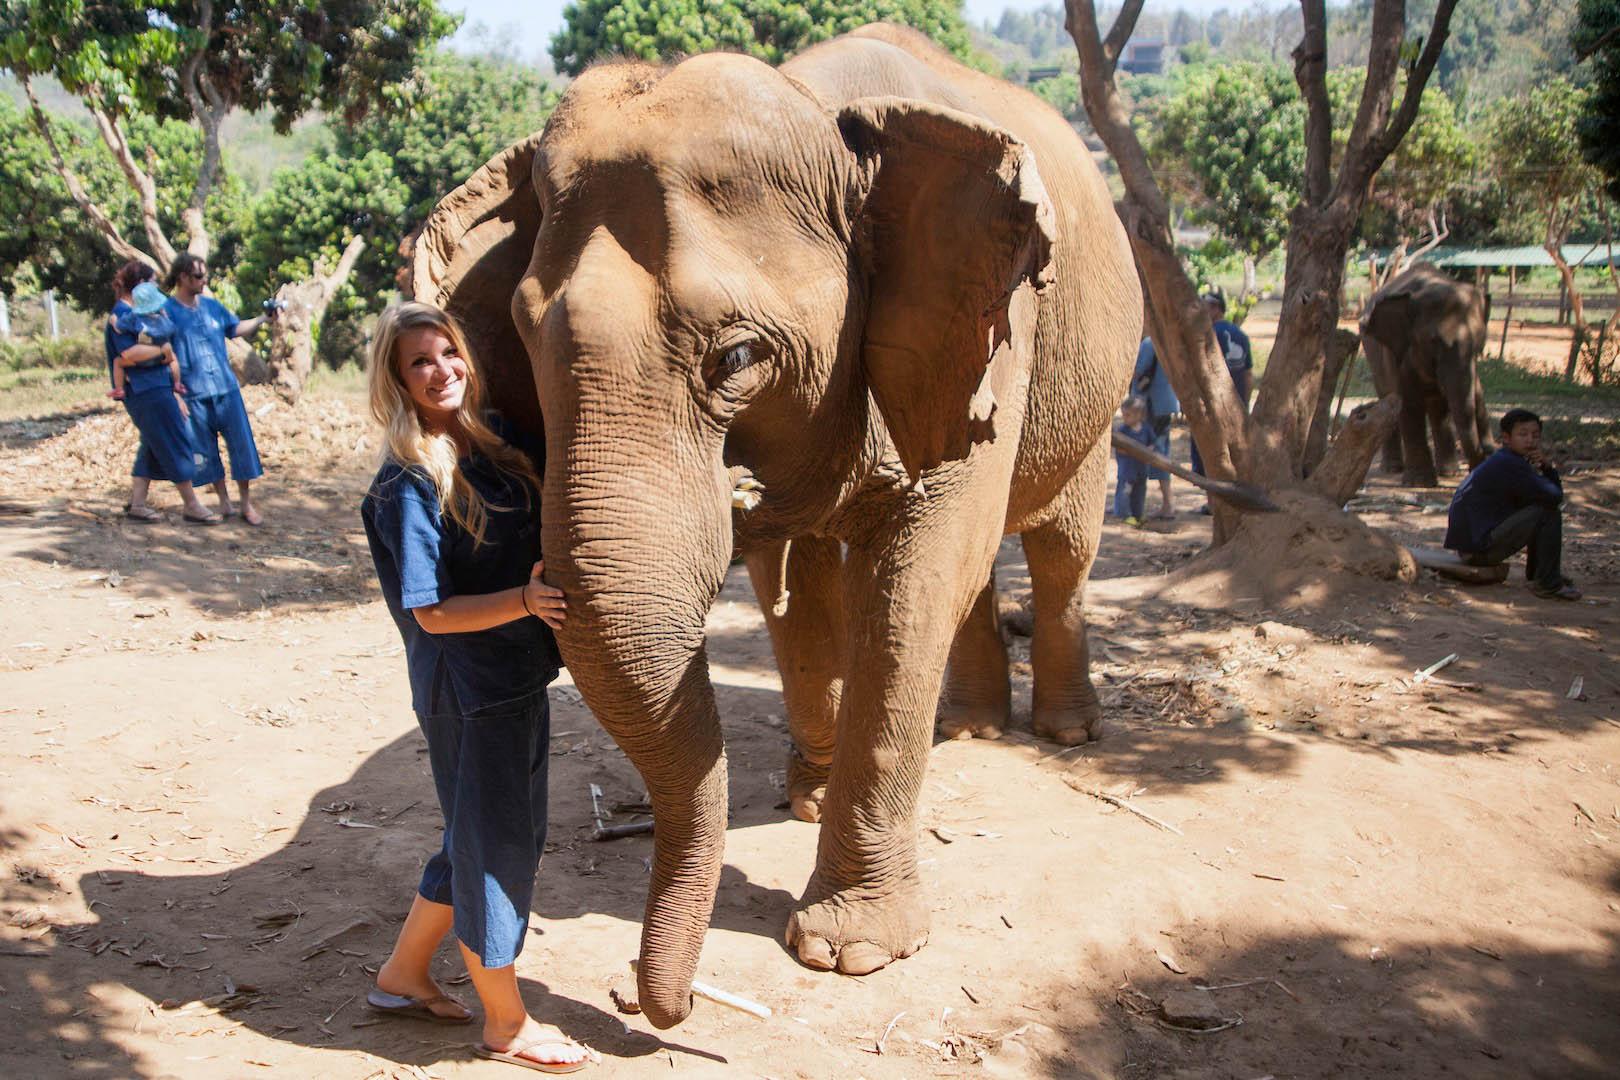 Baan Chang Elephant